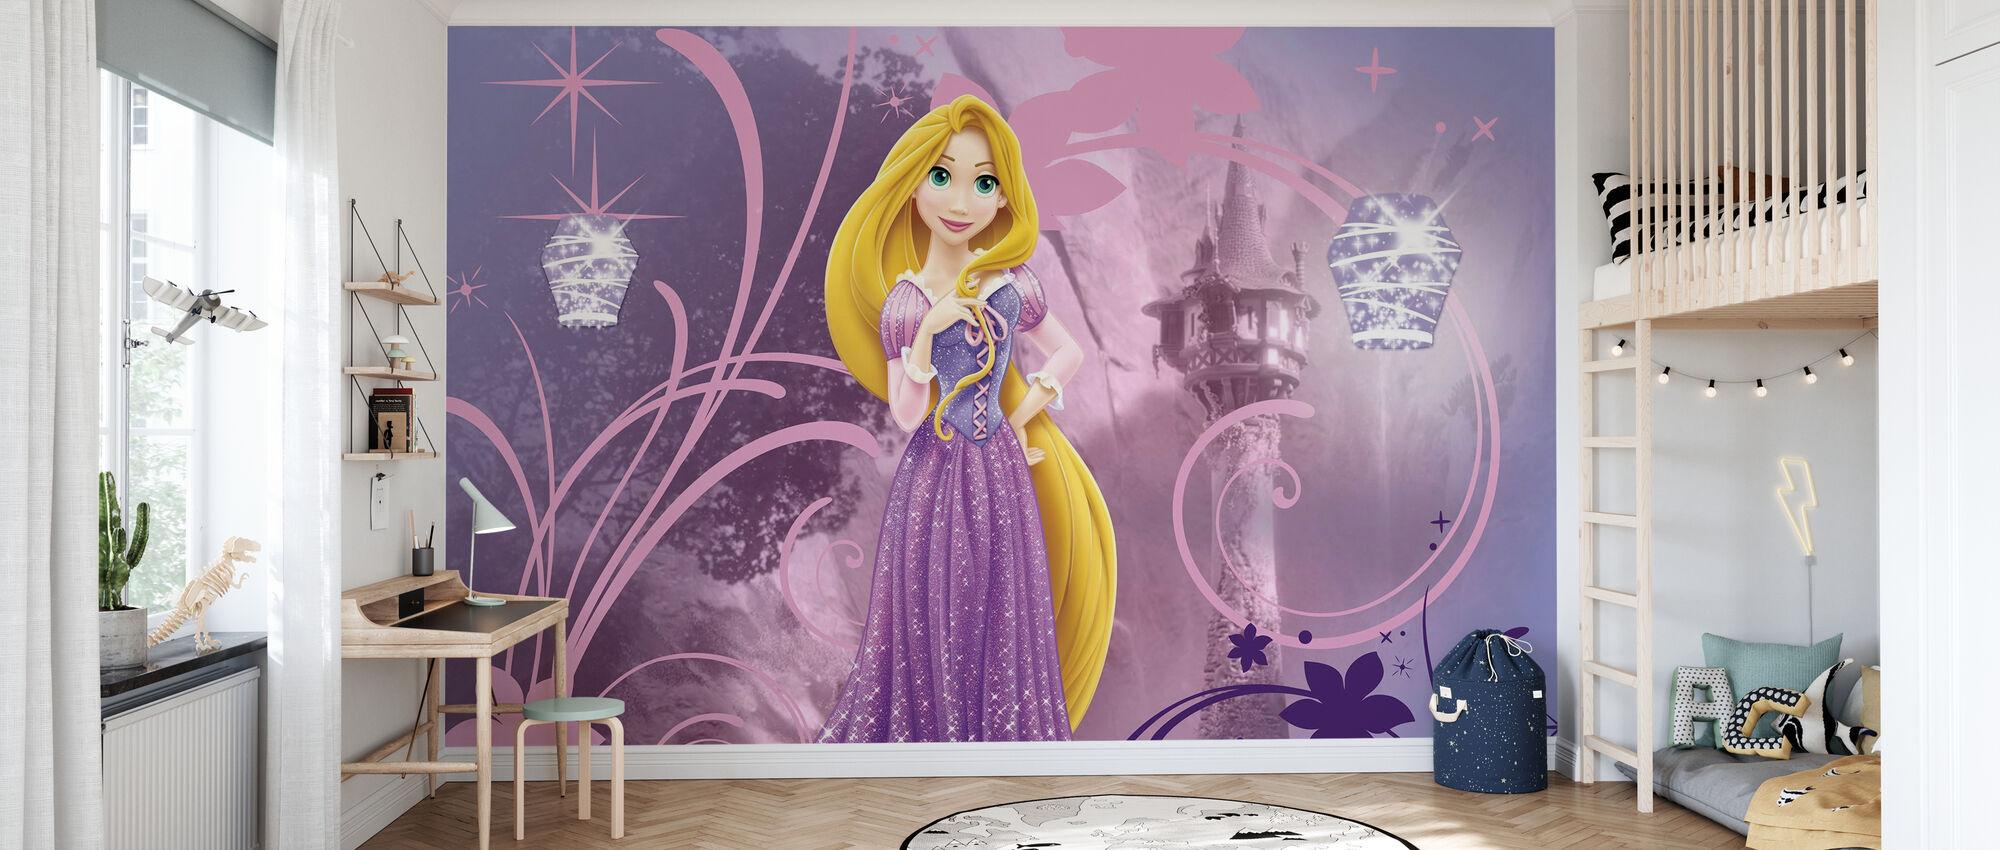 Disney Princess - Rapunzel - Tapet - Barnrum